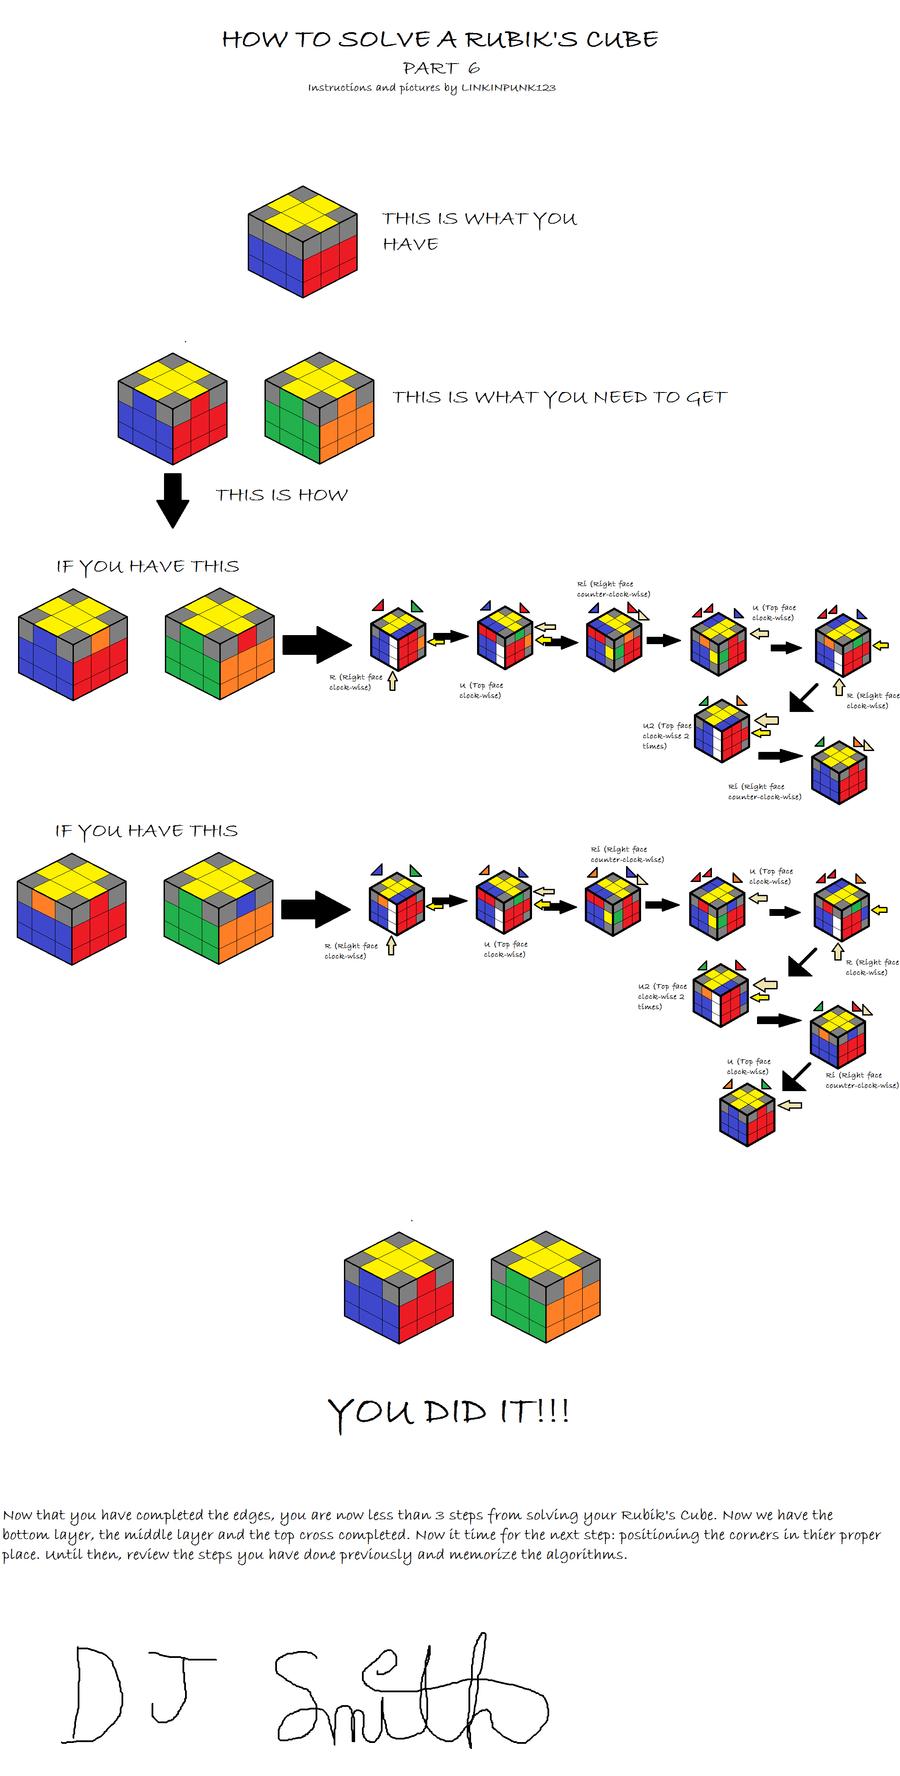 How To Solve A Rubik U0026 39 S Cube 6 By Linkinpunk123 On Deviantart